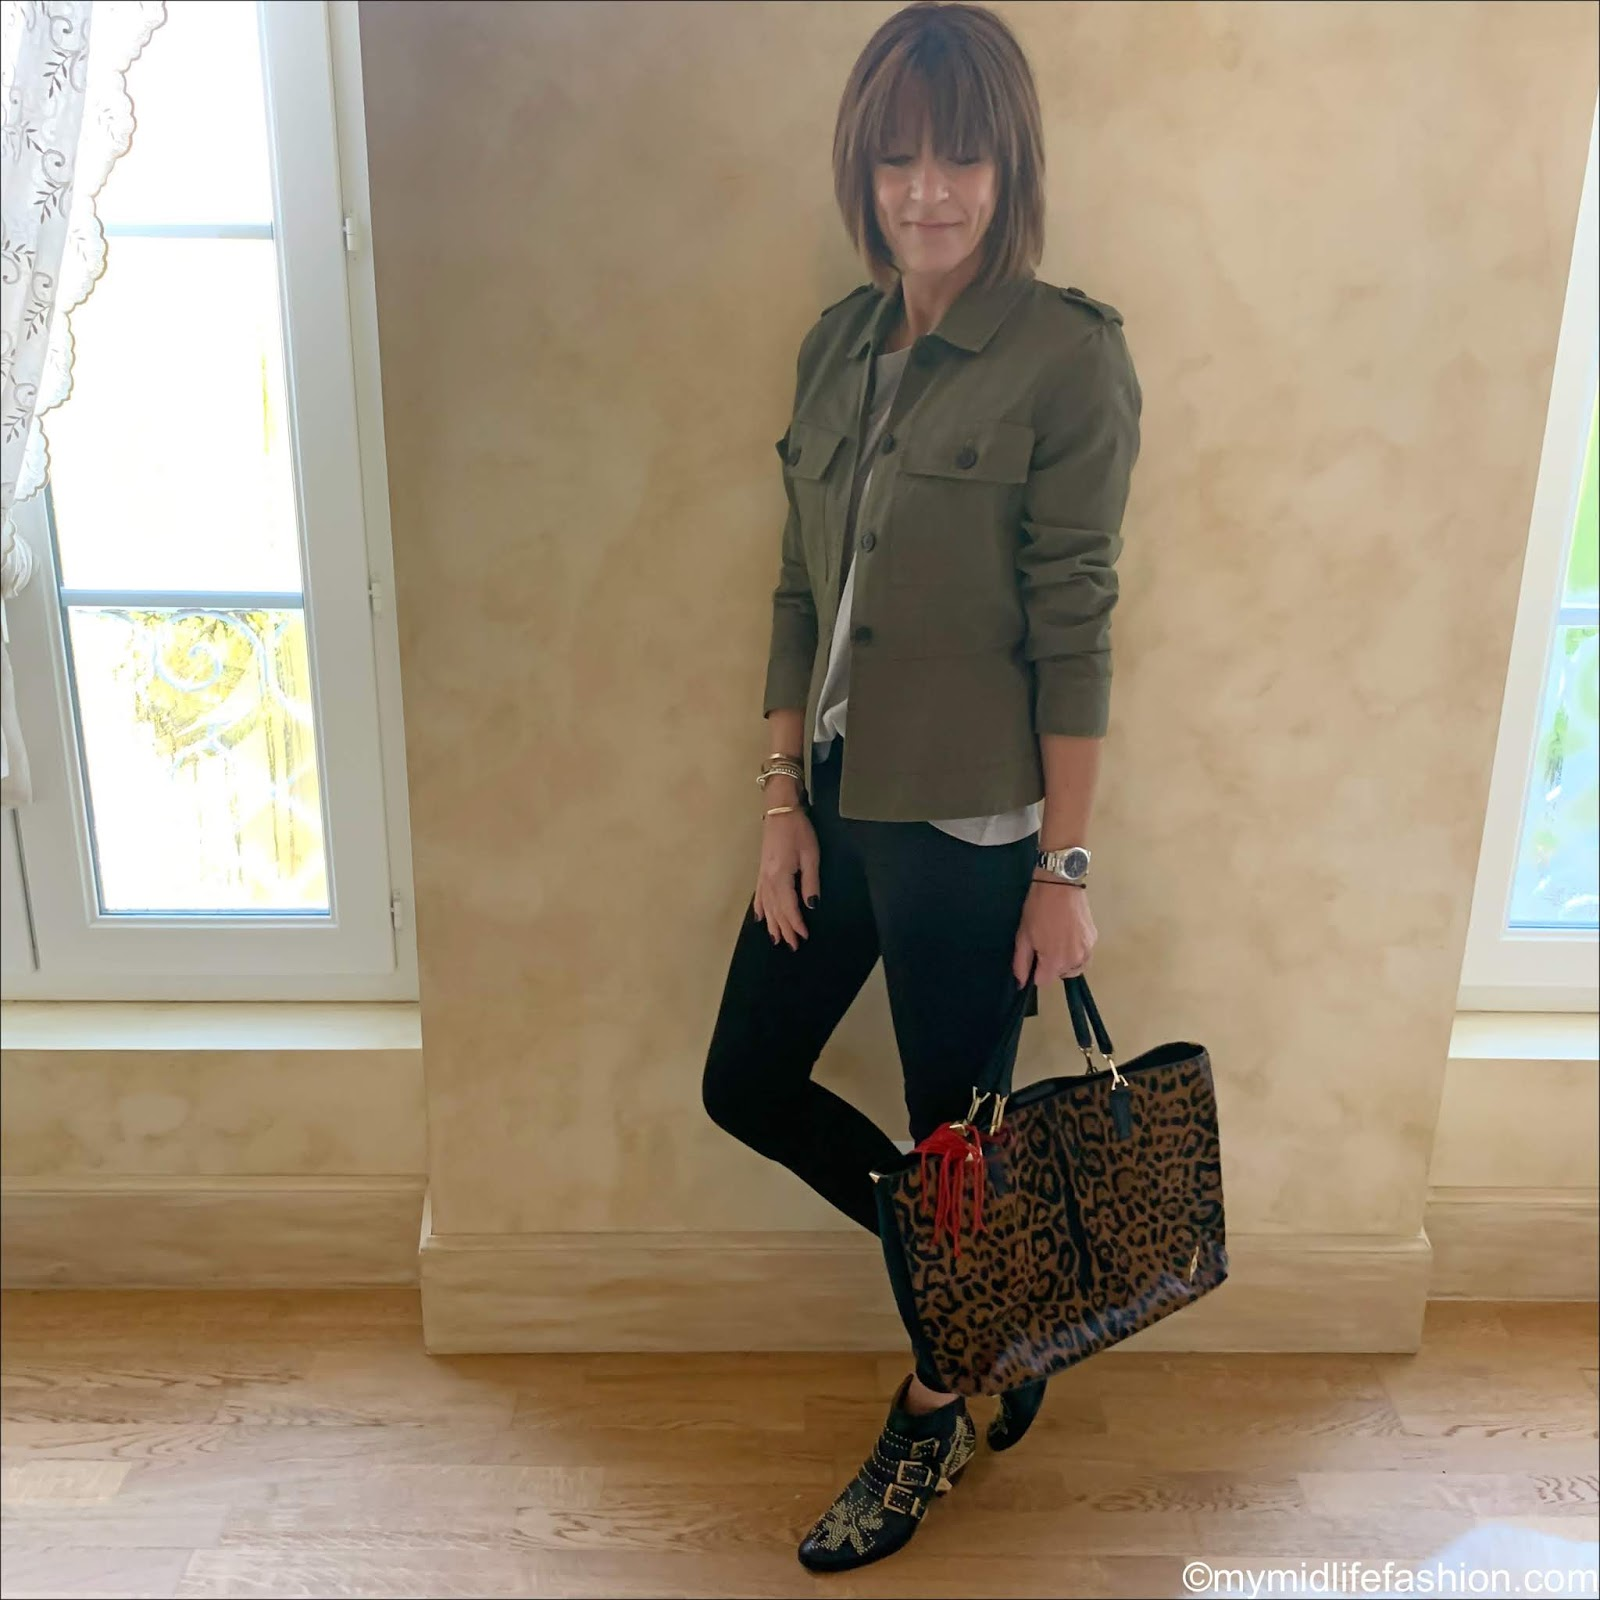 my midlife fashion, j crew shacket, Joseph crew neck t shirt, j crew 8 inch toothpick true black jeans, Chloe Susana boots, Brian Atwood leopard print bag